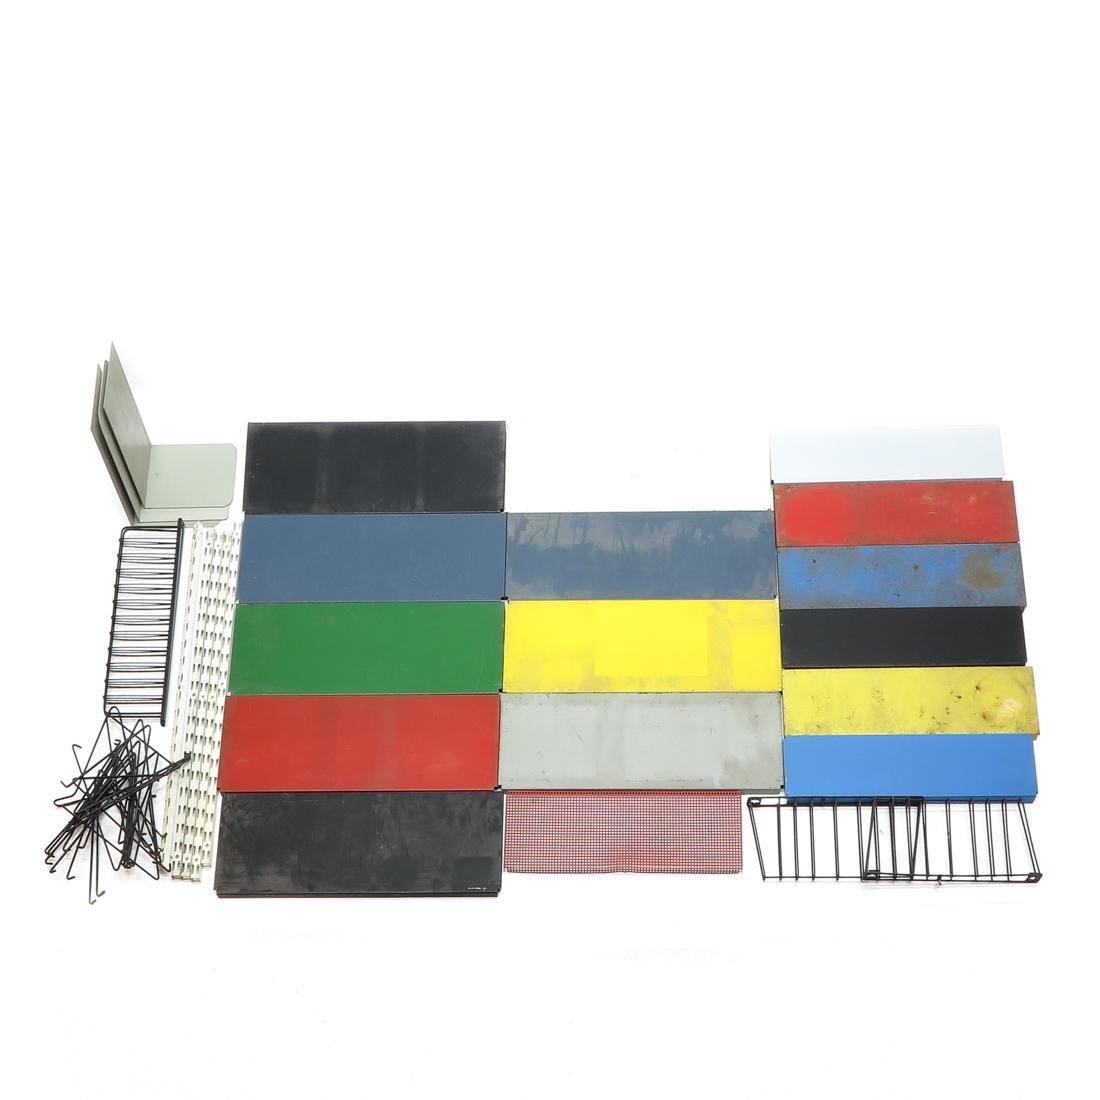 Retro Metal Shelving System